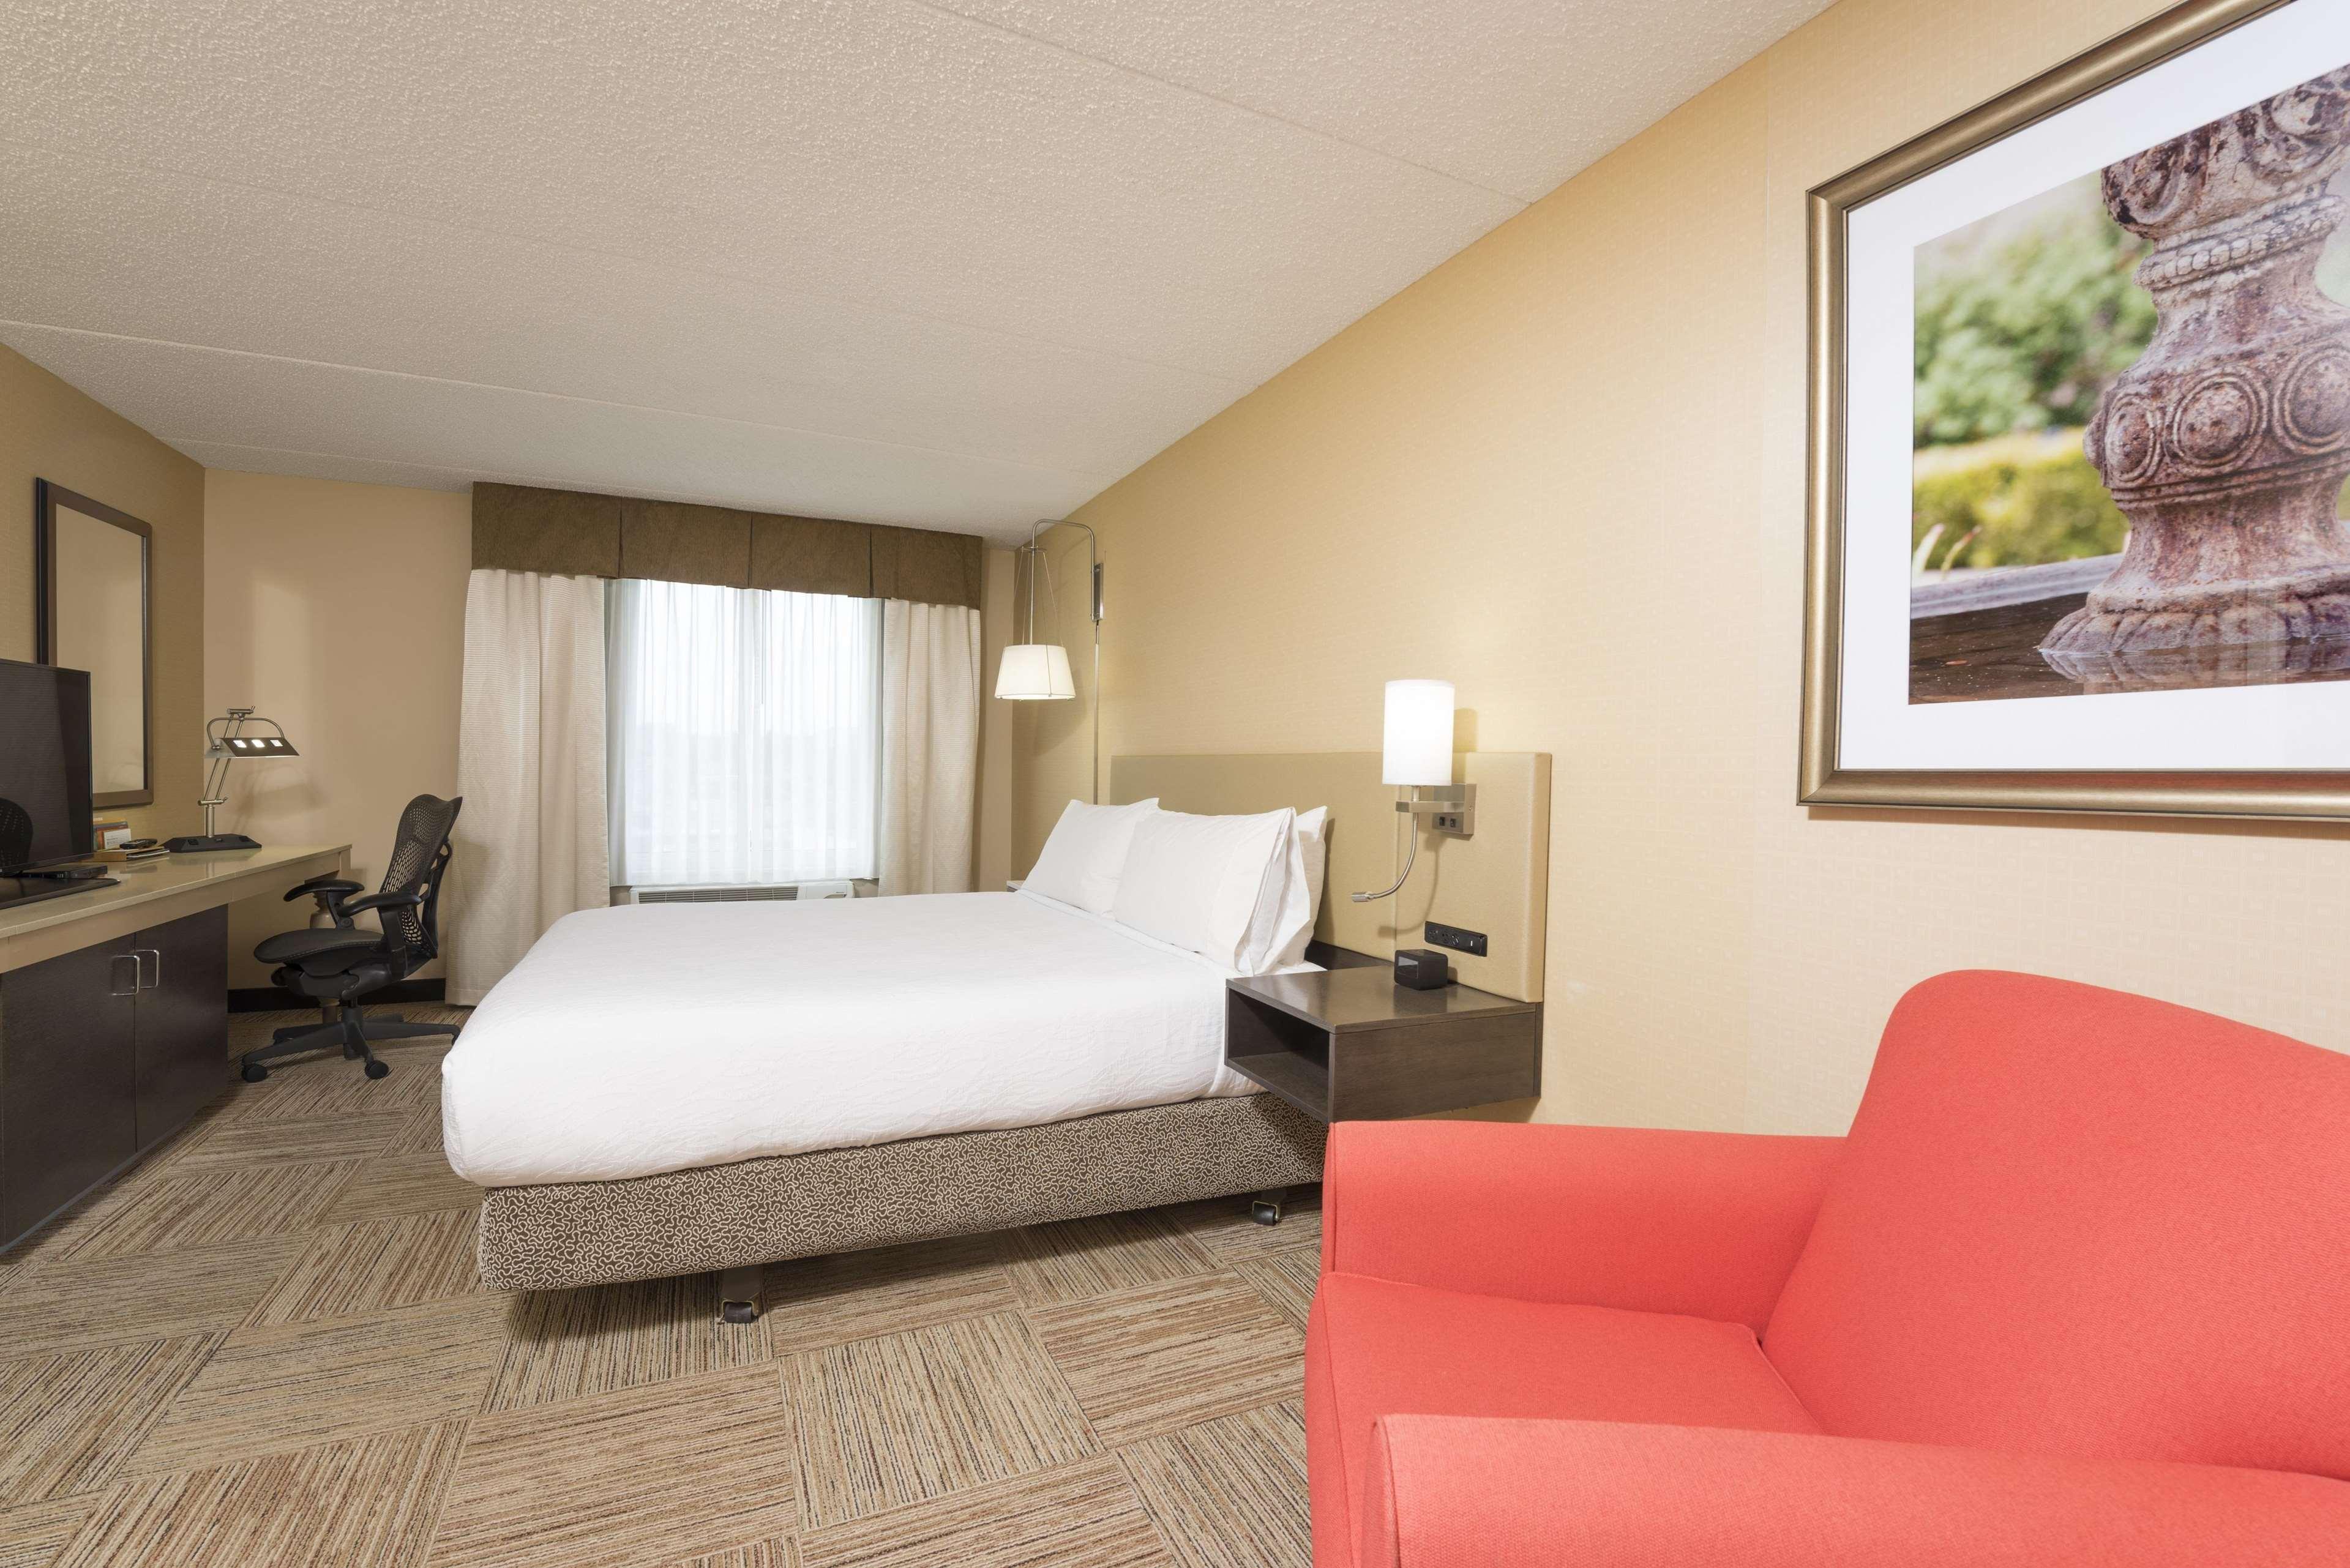 Hilton Garden Inn West Lafayette Wabash Landing image 21